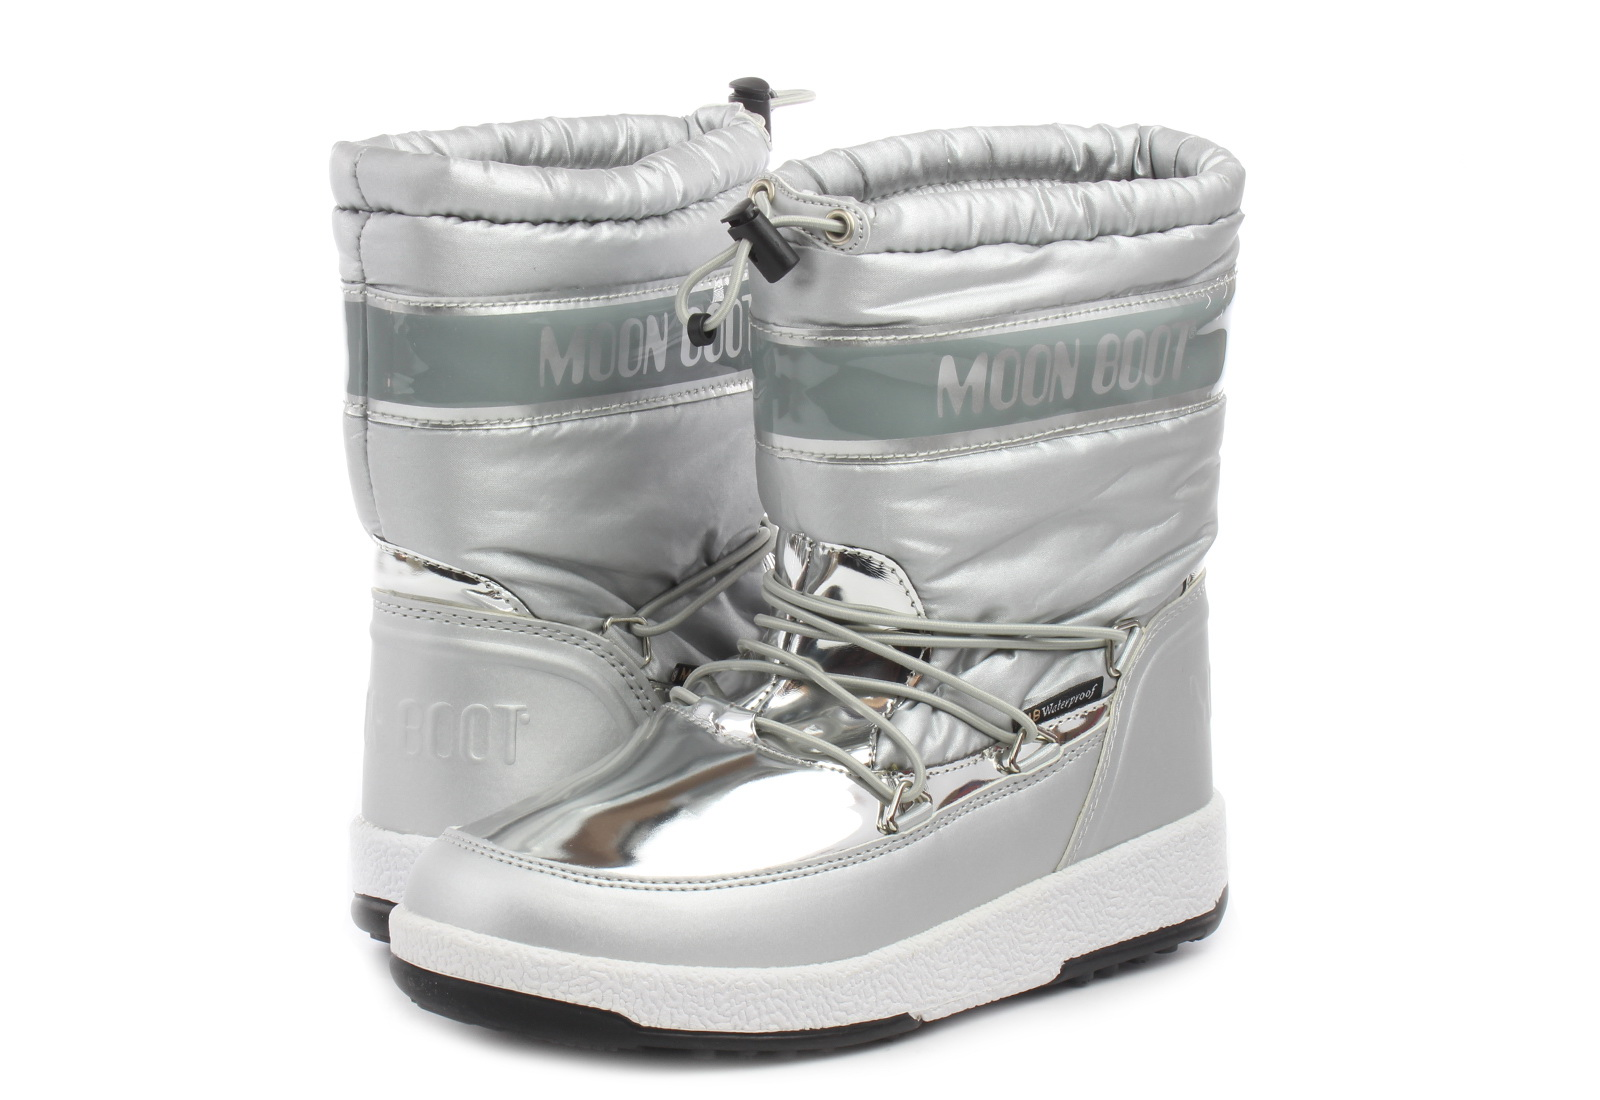 Moon Boot Cizme Moon Boot Jr Girl Soft Wp